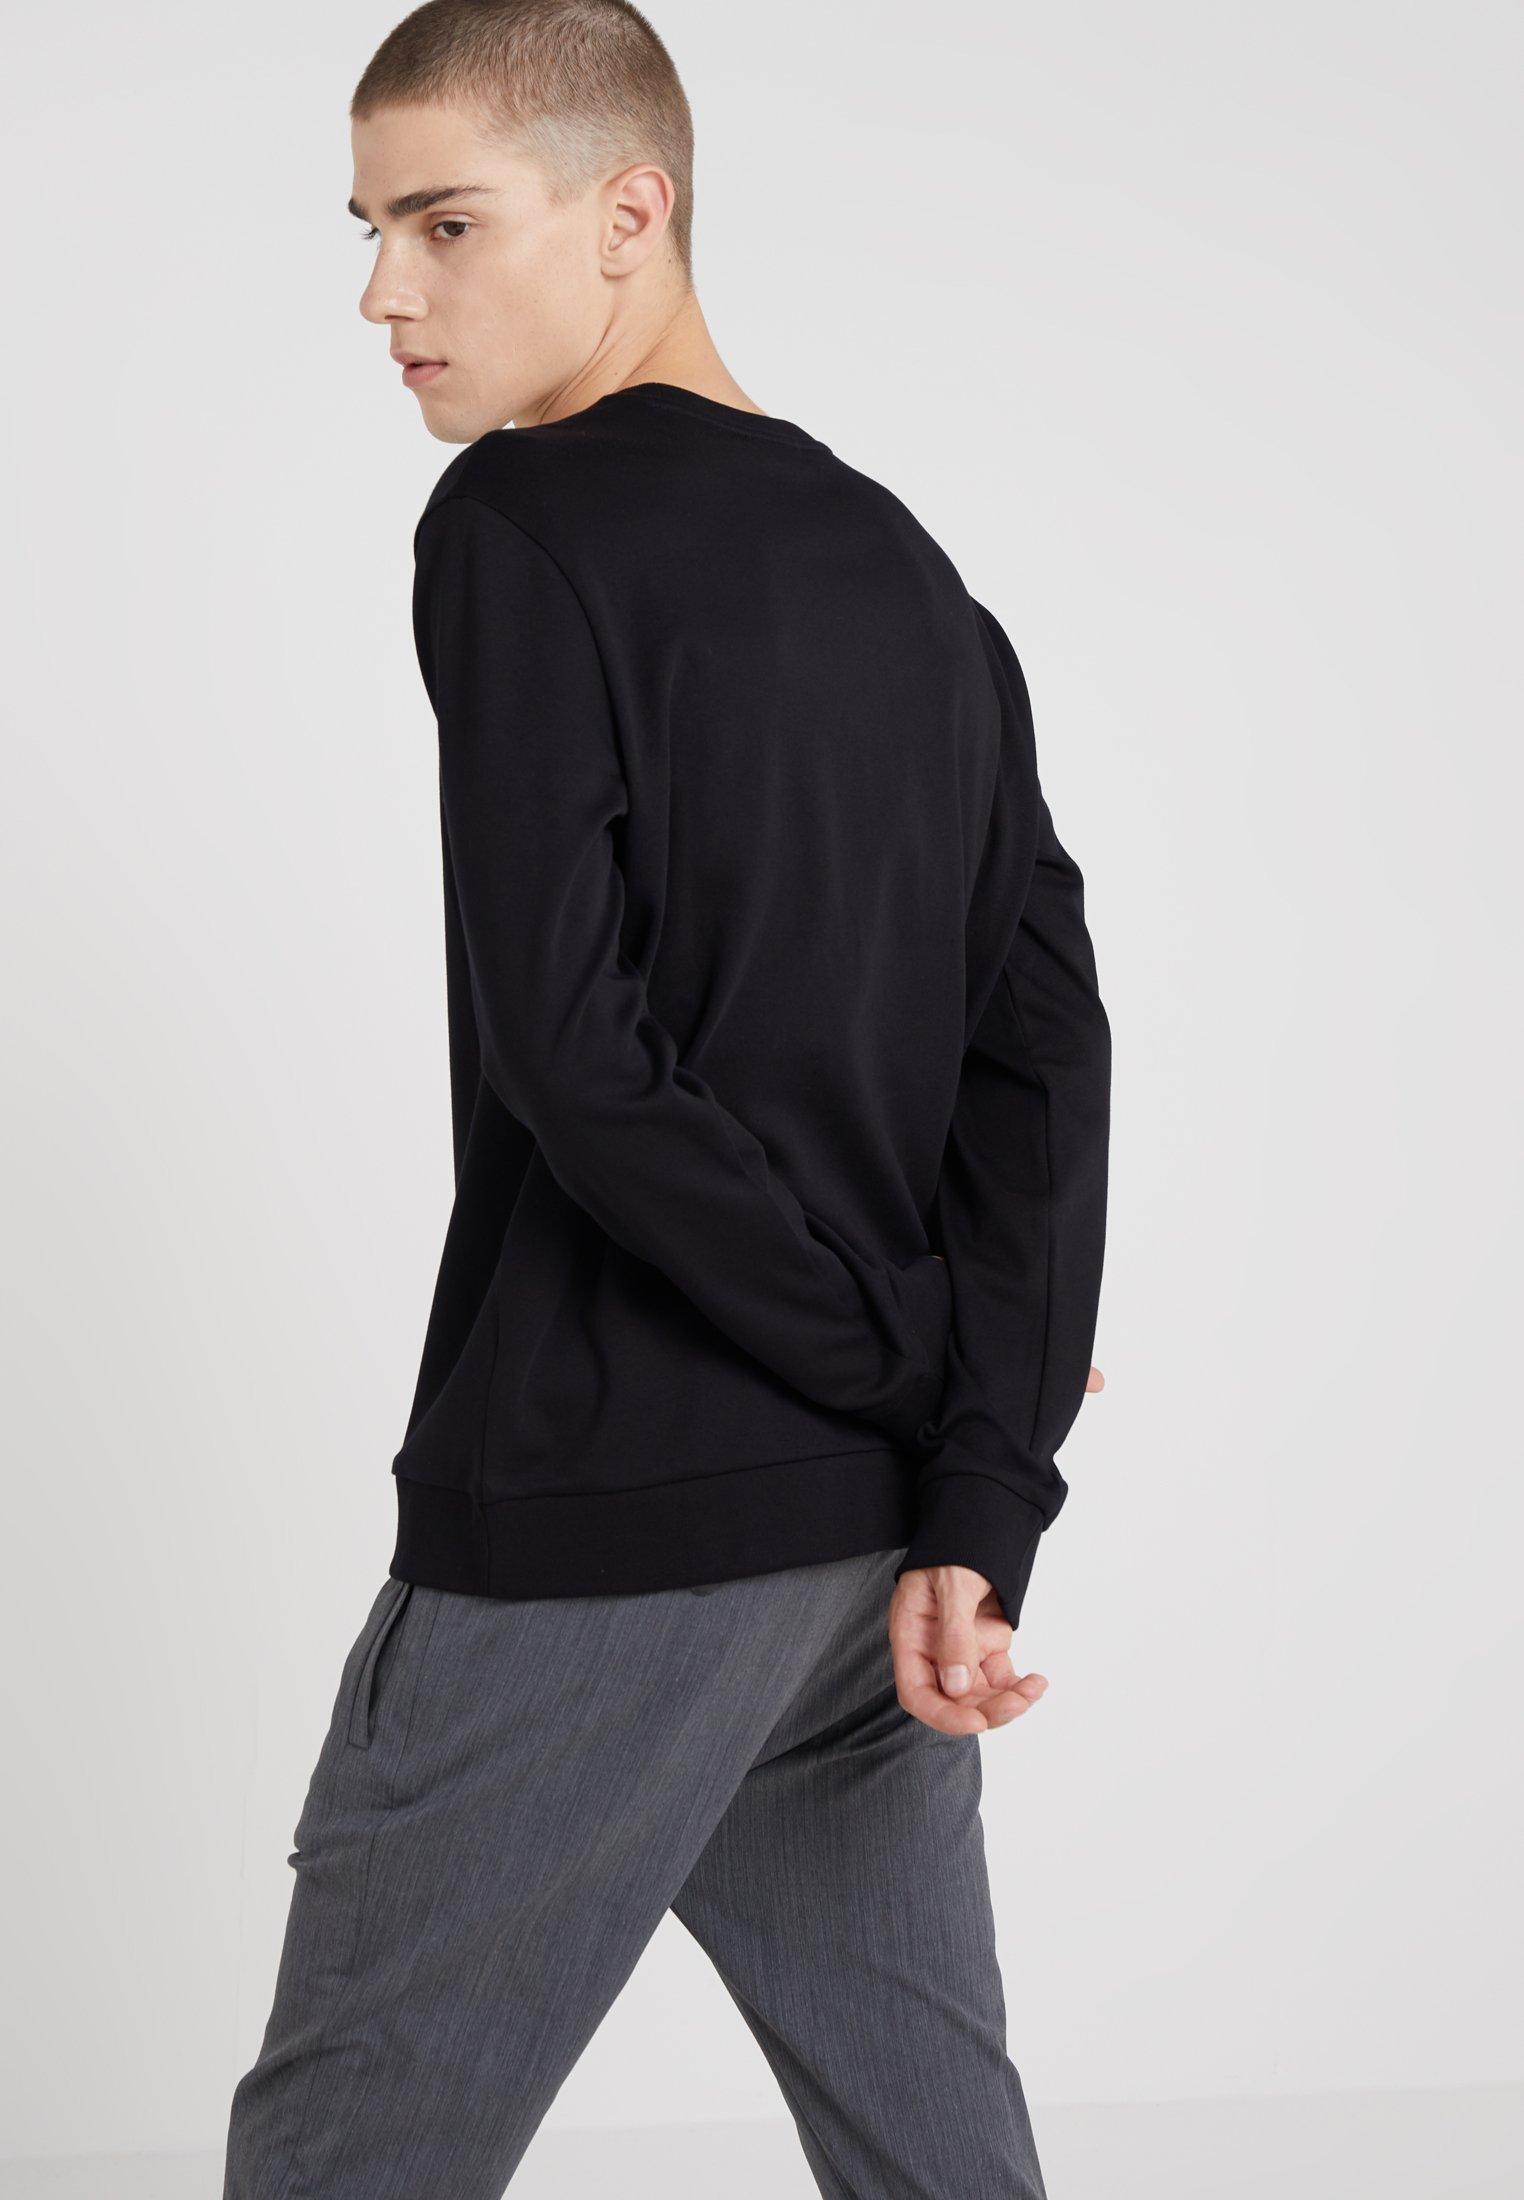 Black Black Hugo DicagoSweatshirt Hugo DicagoSweatshirt Hugo nvwN80m